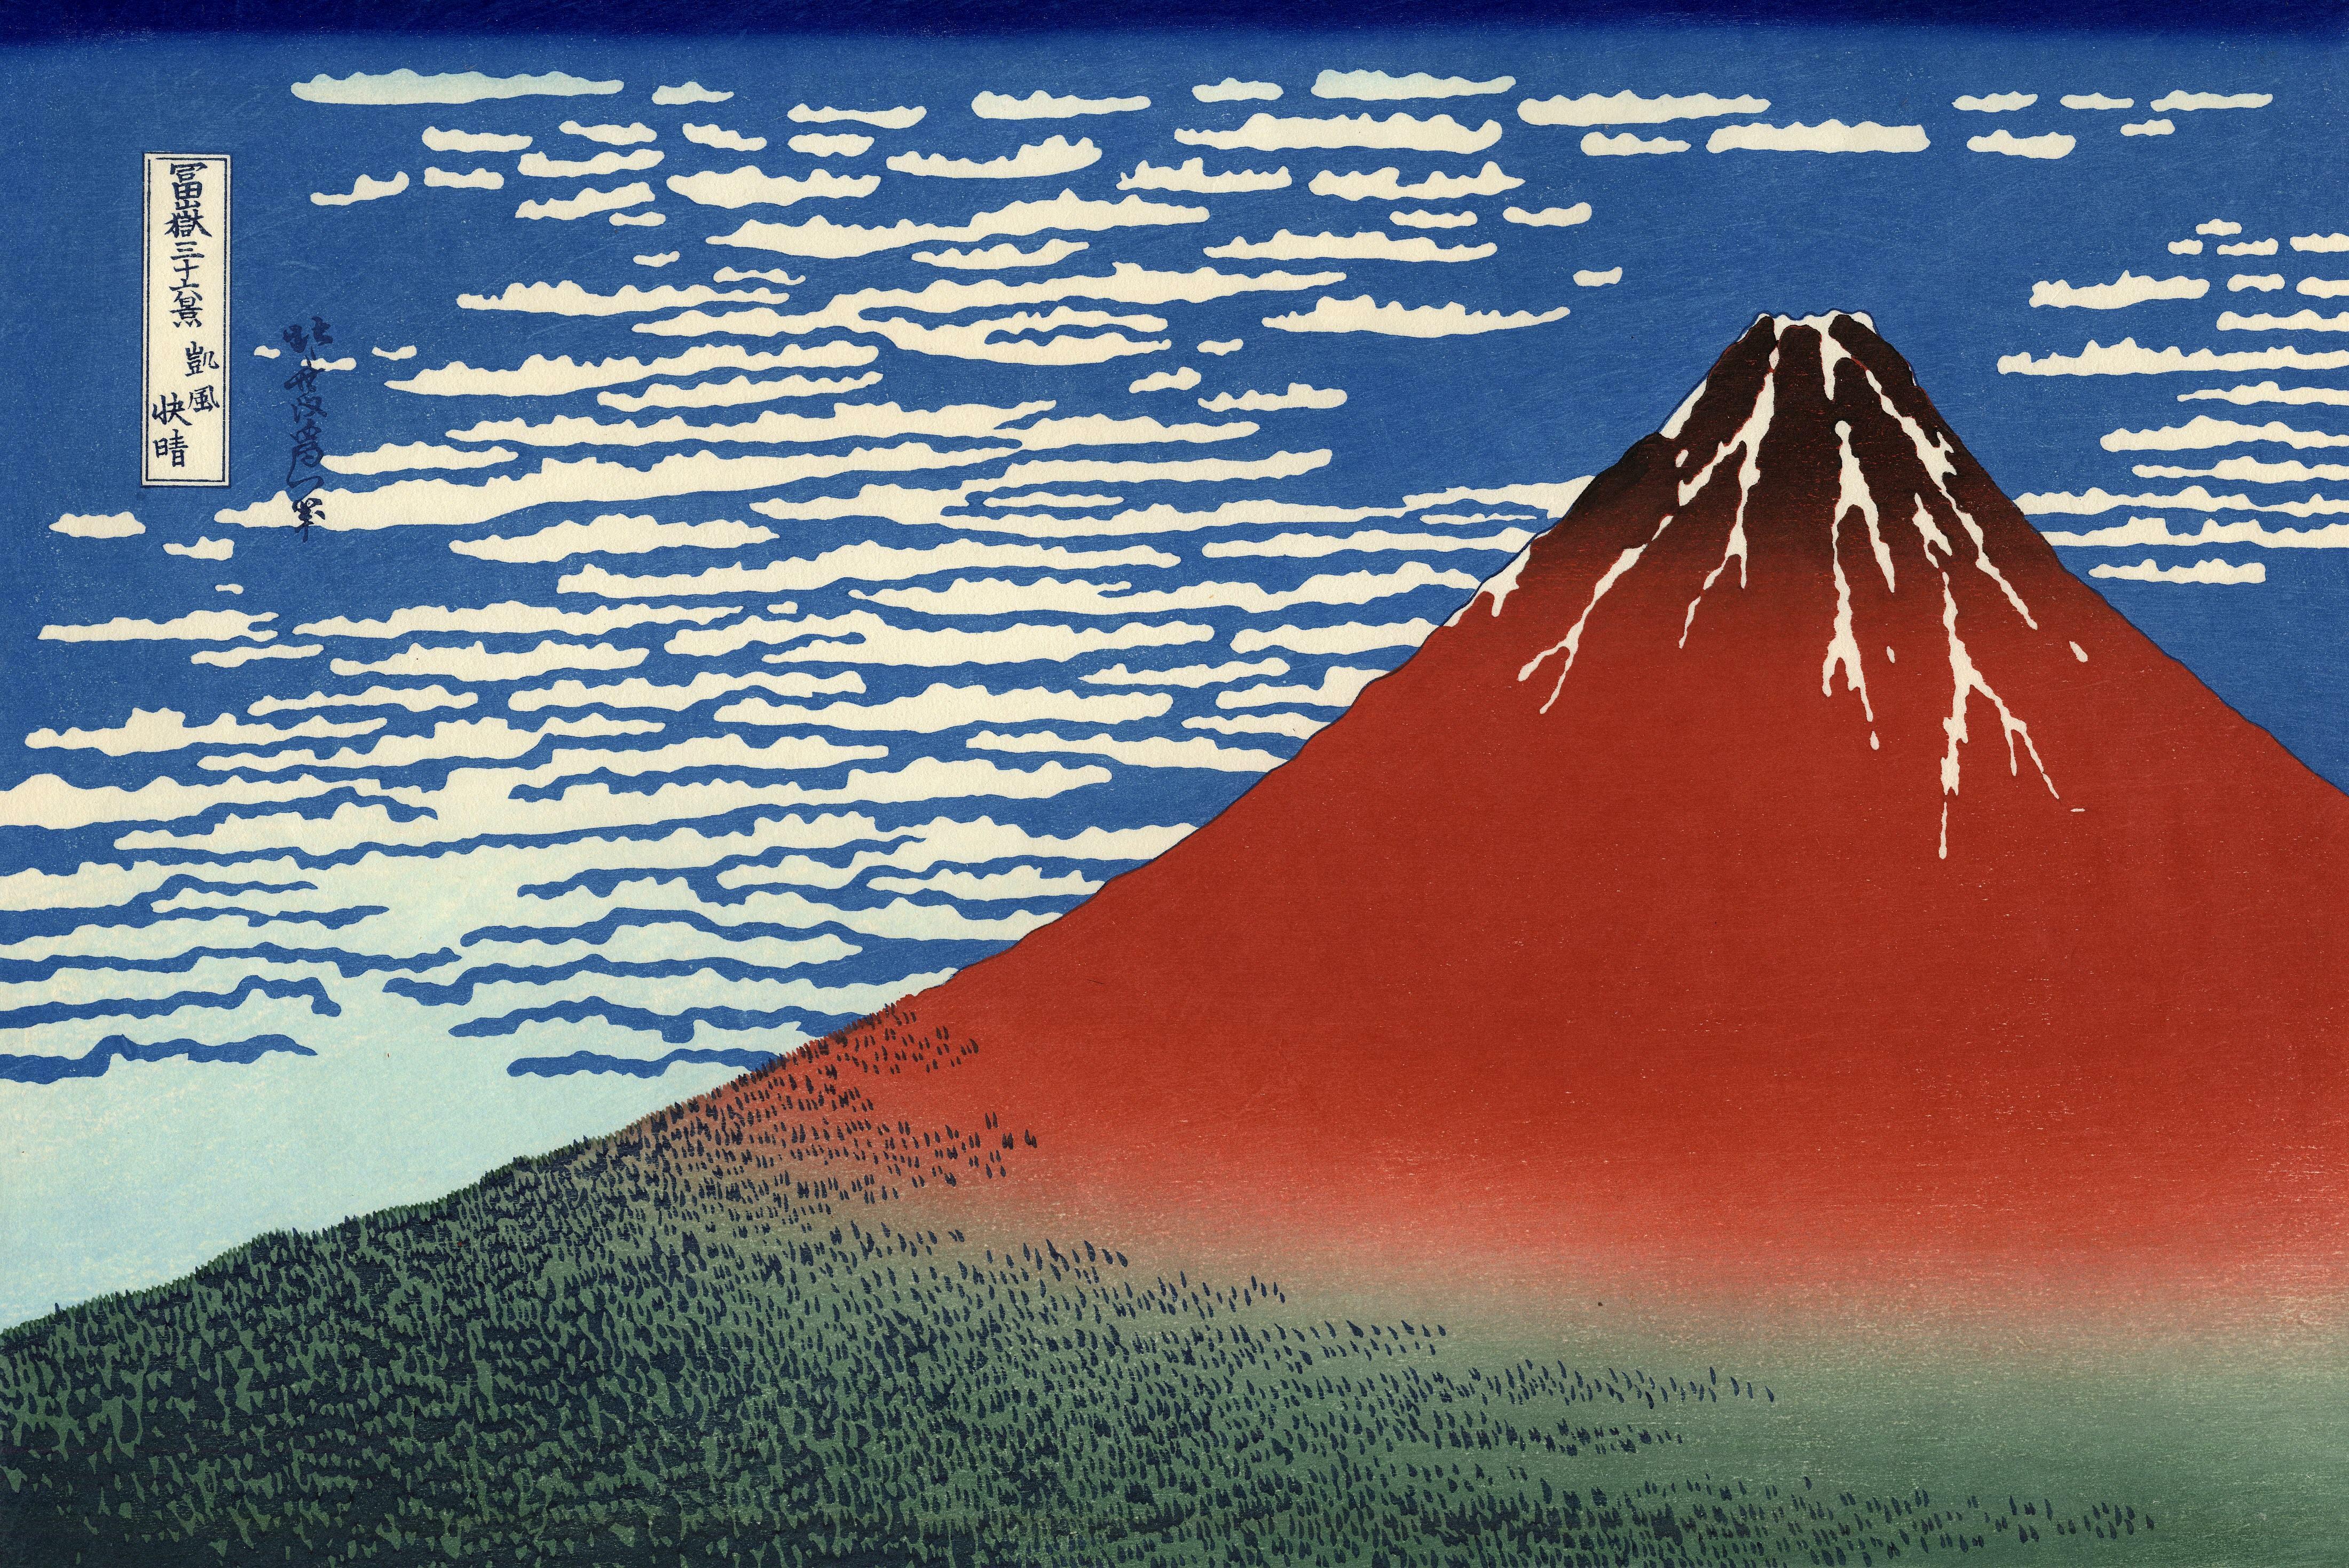 El monte Fuji con tiempo claro, por Katsushika Hokusai